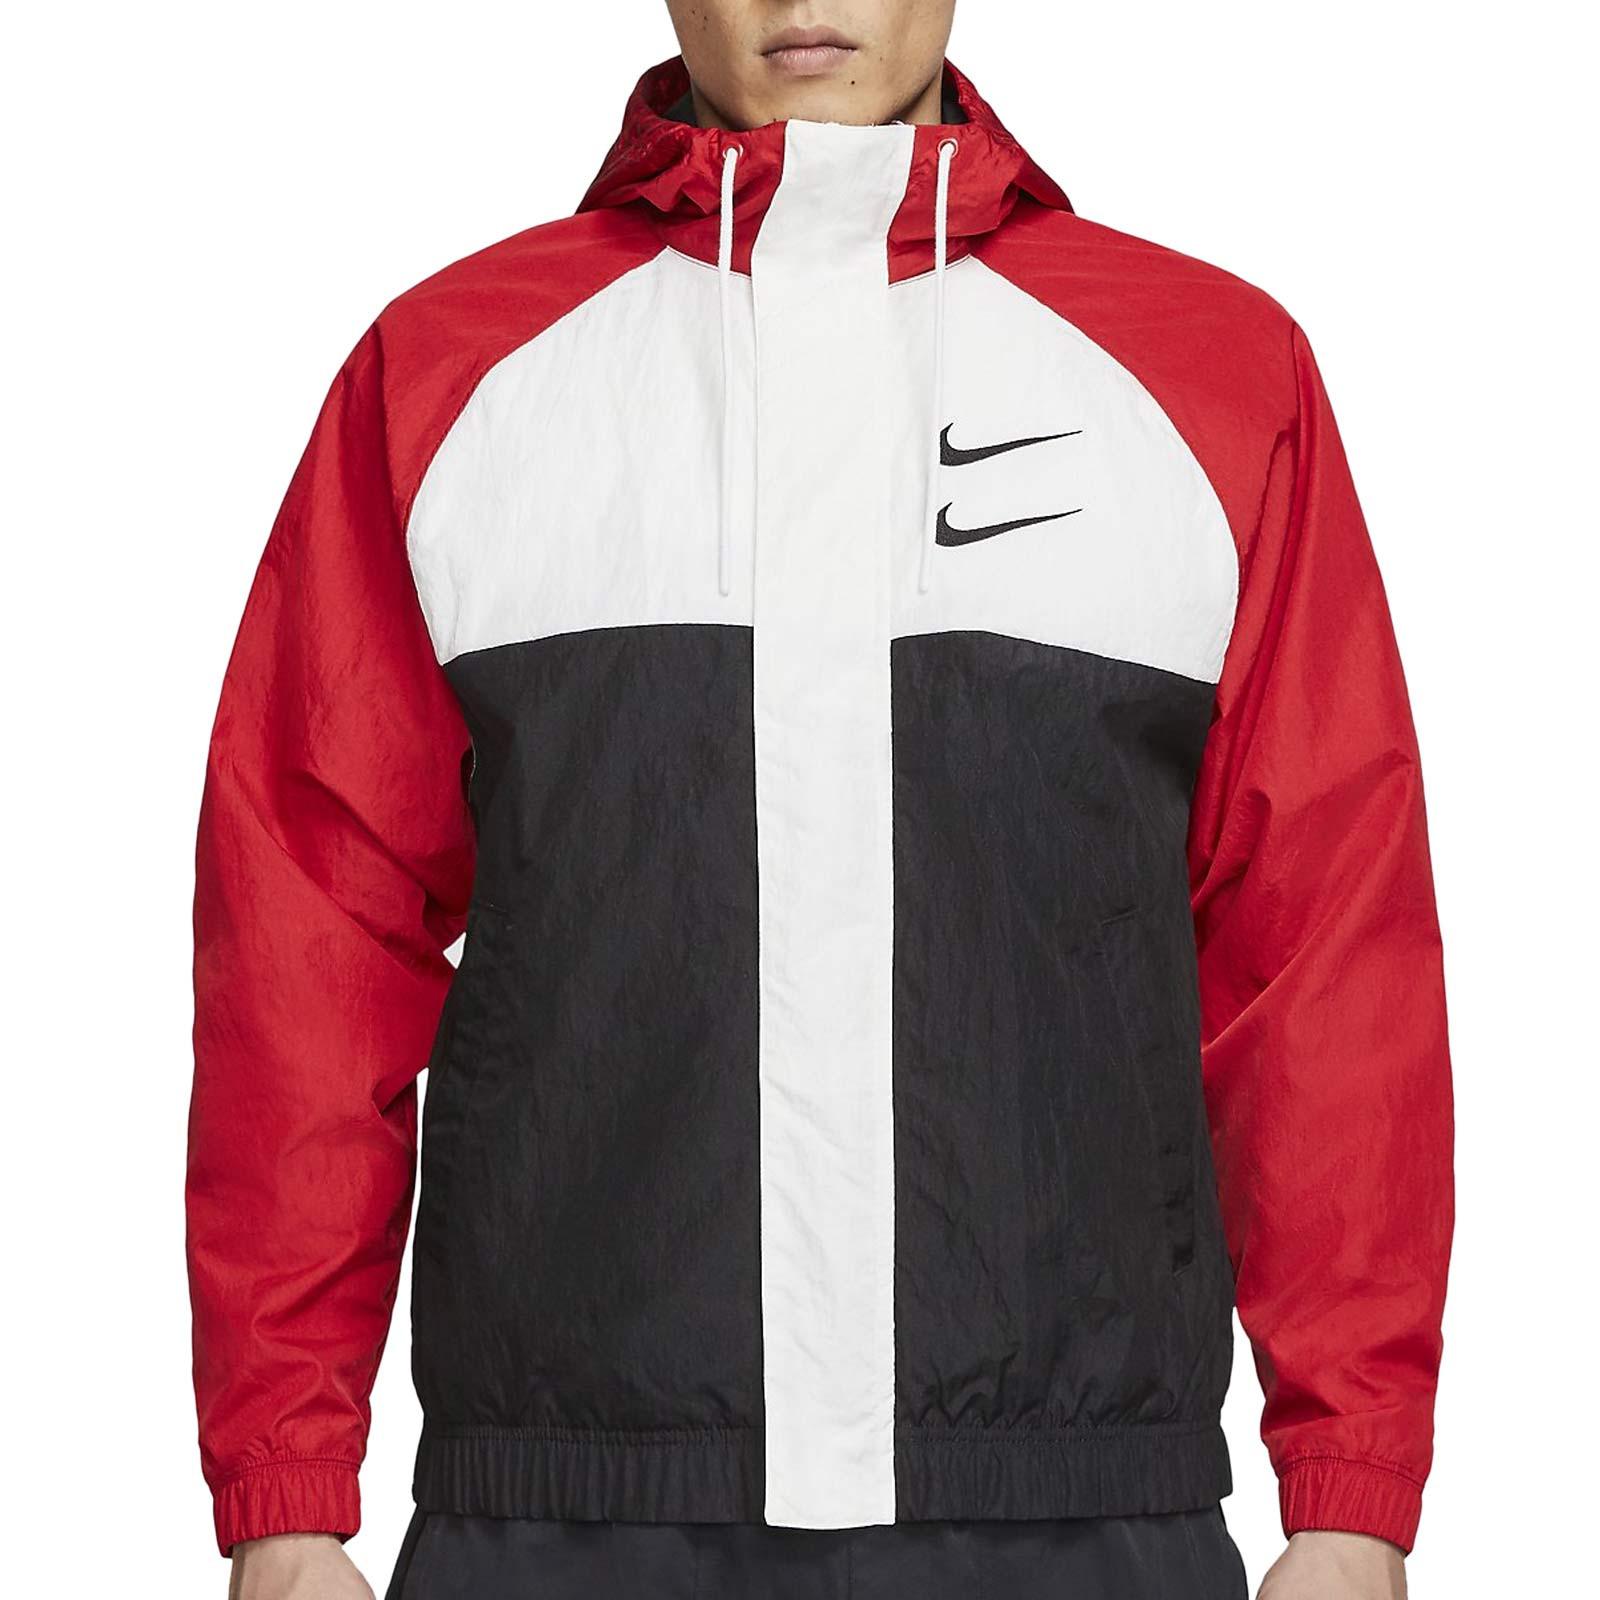 Podrido Objetor nuestra  Chaqueta Nike Sportswear Swoosh Hoodie rojo | futbolmania